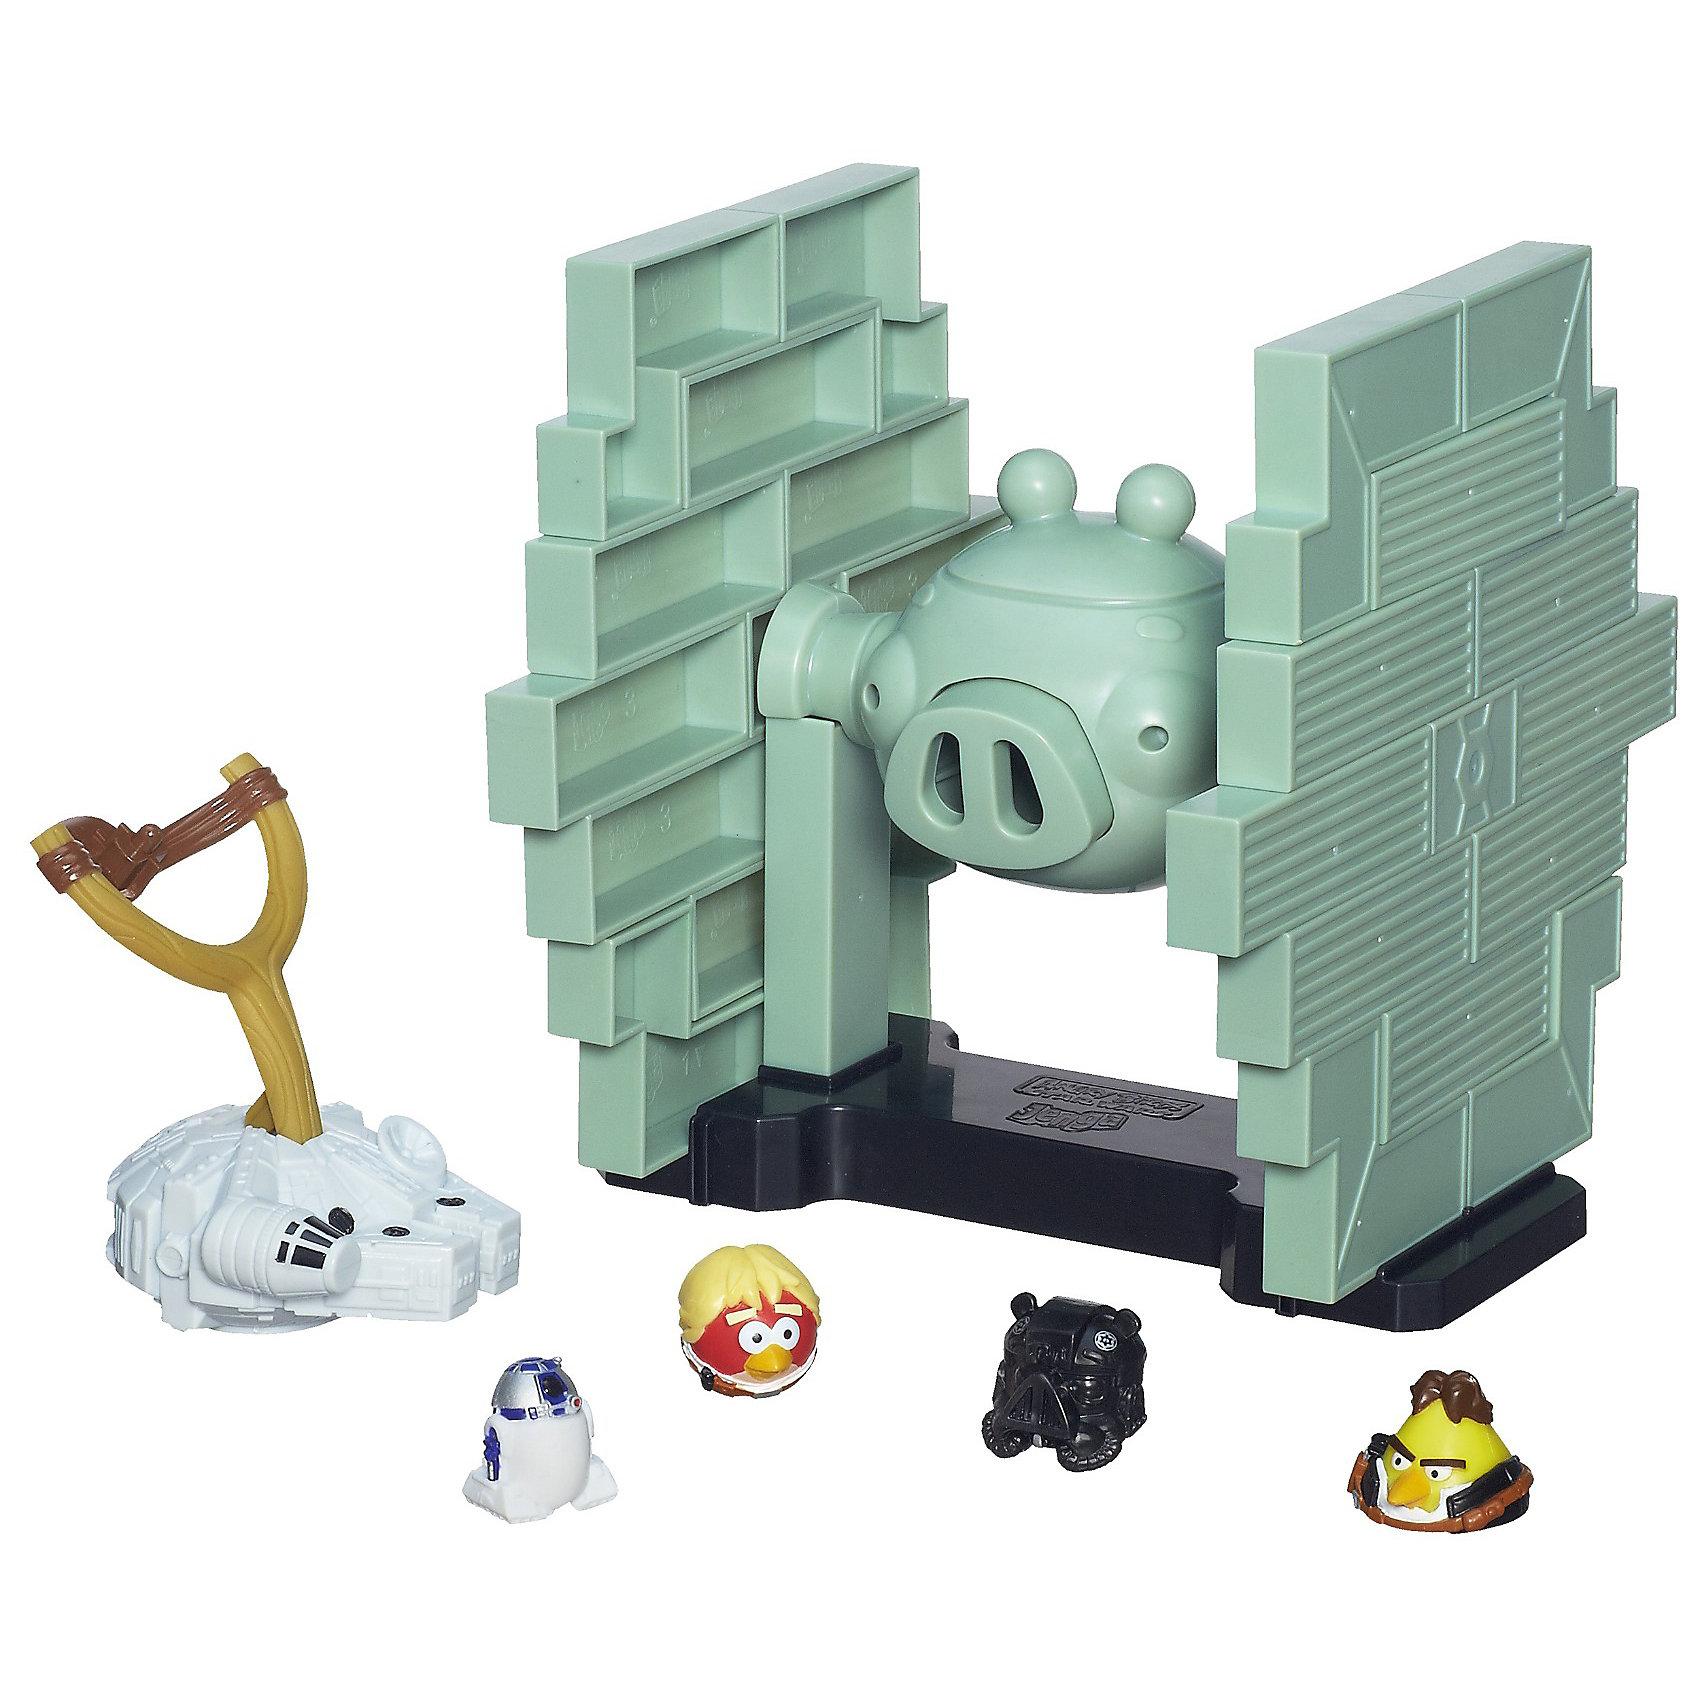 ������: ����������� ������ ���,  Angry Birds Star Wars, Hasbro������: ����������� ������ ���,  Angry Birds Star Wars  - ������������� ��-���� ���� ��� ����������� ���� ������.<br><br>�� ������� ����������� ������� ��� ������ ��������? ������� ���! ����� �����, ��������� ������ ������� ������������ ����� � ���� ����������� ���! � ����� ������� �� ������� ��������������� ���������� ������������ ����� ��������, ��� � ����� ������� ����� ����� ���� � ����� �����������, � � ������ ��������� ������. �� ������ ����� �������, ��� �������! � ��������� ��� ��� ����������.<br><br>�������������� ����������:<br><br>- � �������� ������: ������ ������� (� ��������), ����������� ���, ������.<br>- ������ ��������: 330�267�76 ��.<br>- ��������: ����������.<br>- �����: Angry Birds Star Wars (���� ������)<br><br>������: ����������� ������ ���,  Angry Birds Star Wars  ����� ������ � ����� ��������-��������.<br><br>������ ��: 76<br>������� ��: 330<br>������ ��: 267<br>��� �: 720<br>������� �� �������: 96<br>������� �� �������: 144<br>���: �������<br>�������: �������<br>SKU: 3397012